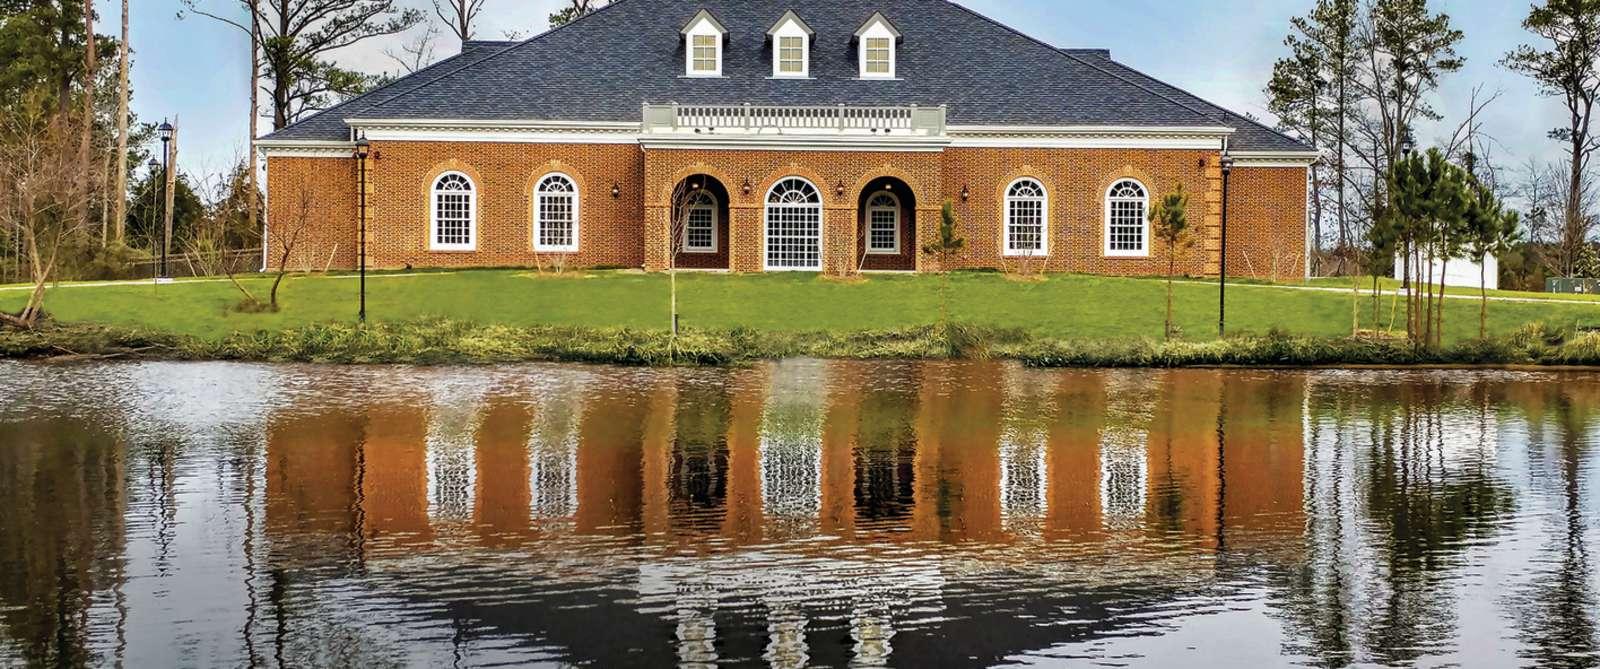 Great Bridge Battlefield and Waterways Museum in Chesapeake